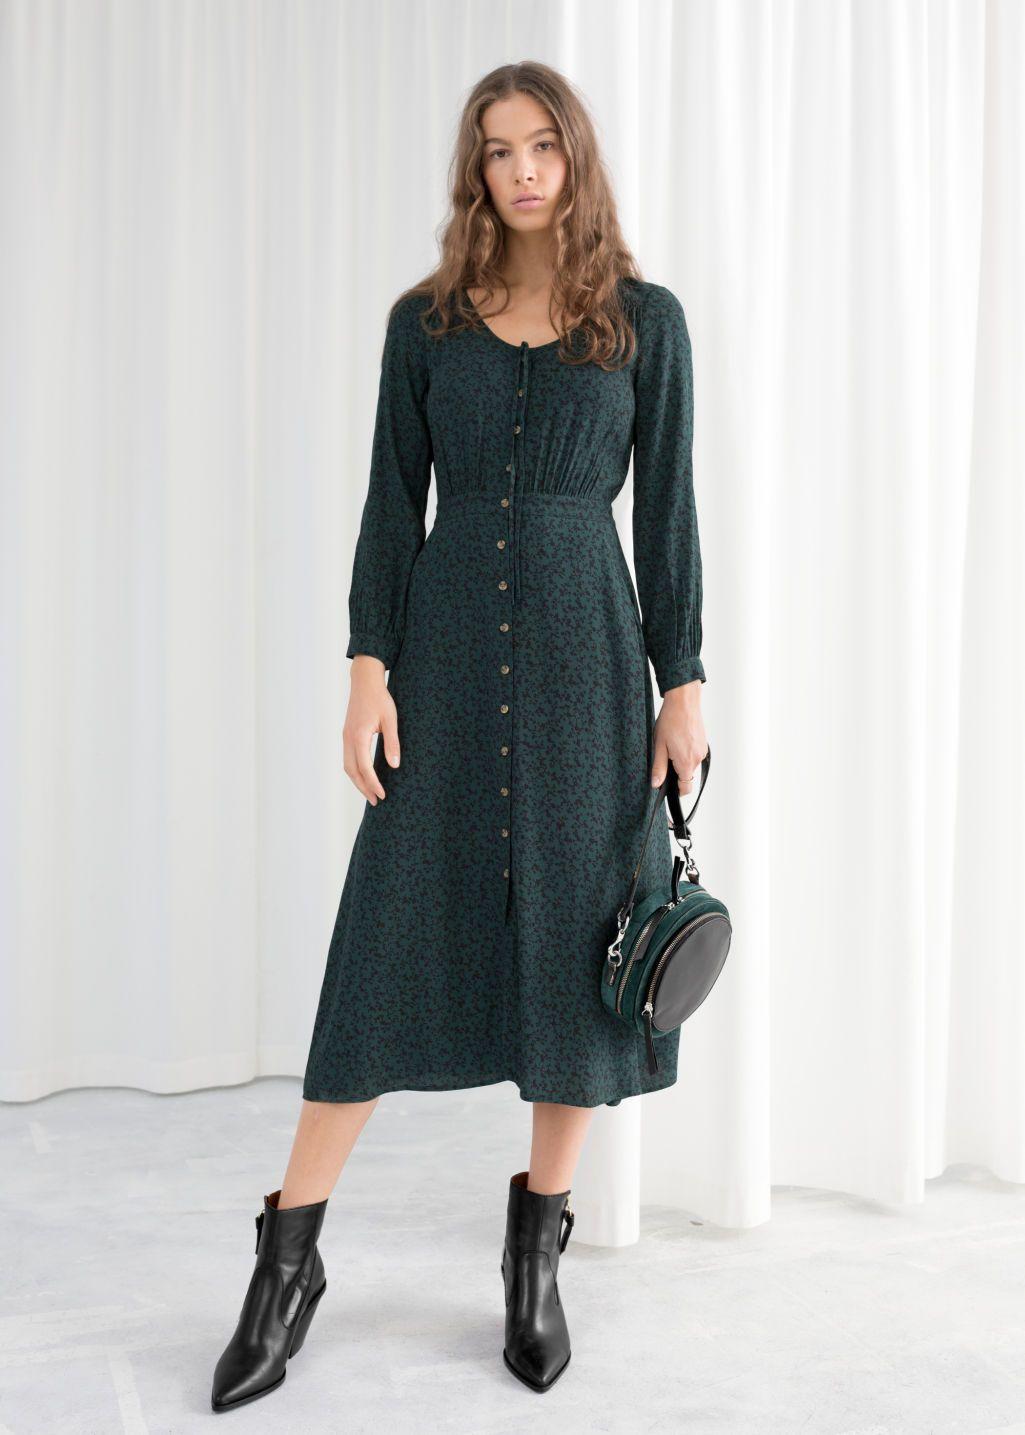 Printed Button Up Midi Dress Midi Dress Print Buttons Dresses [ 1435 x 1025 Pixel ]